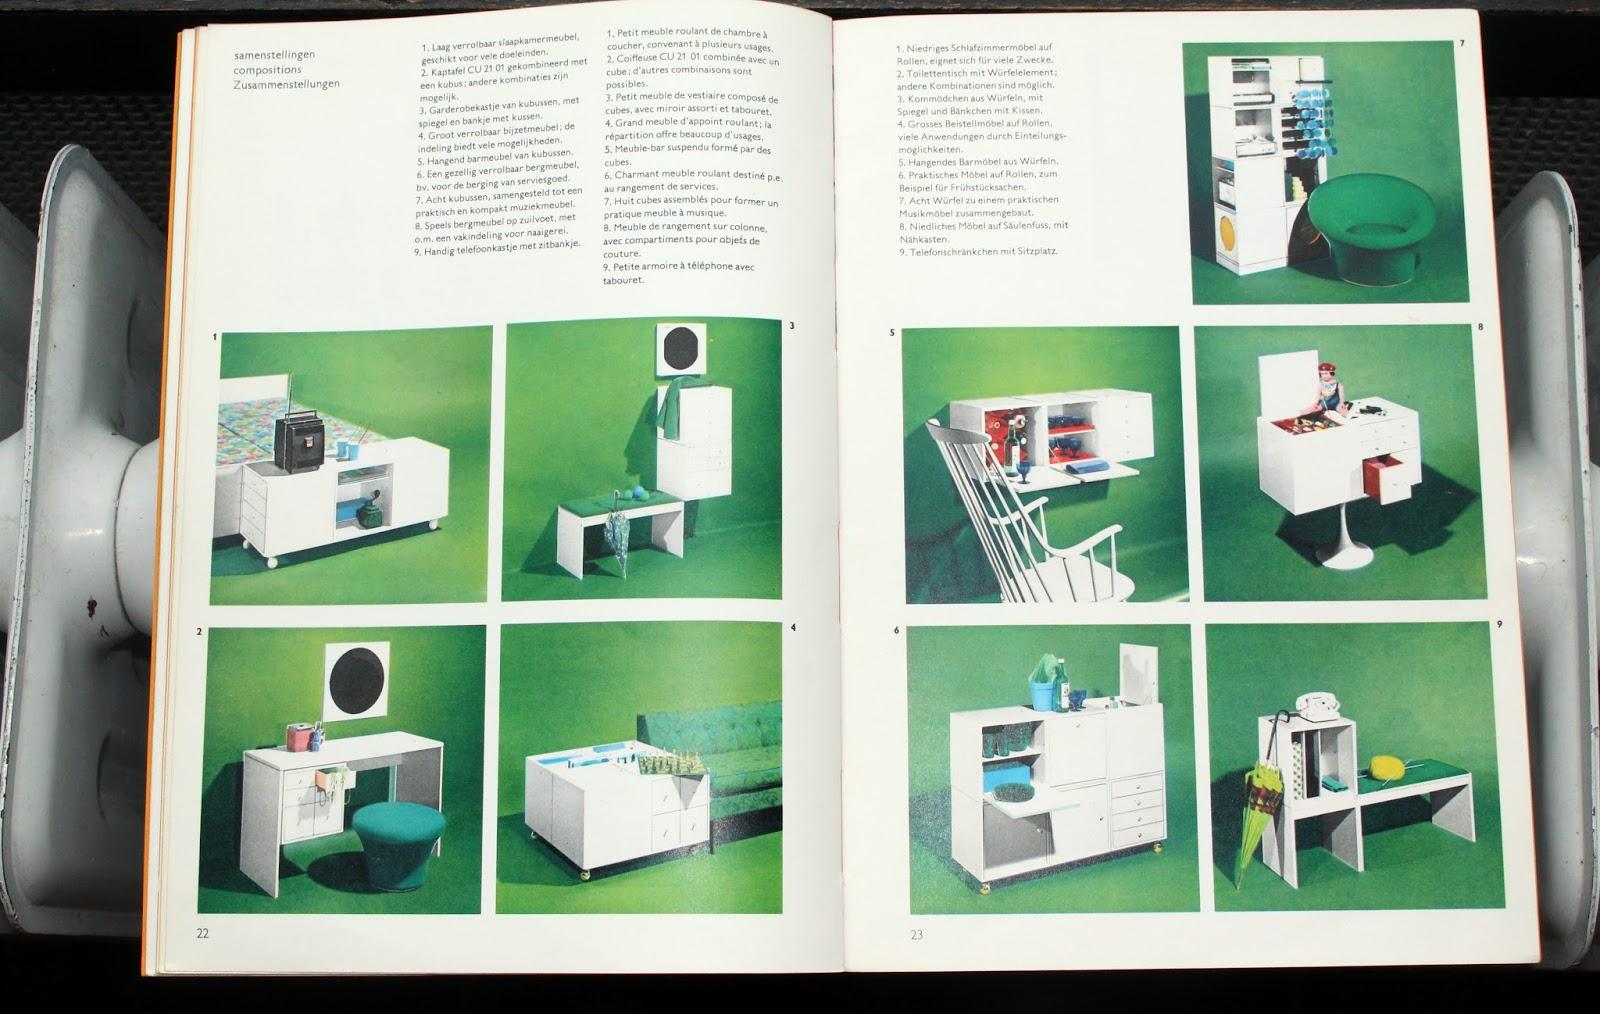 Pastoe Cees Braakman Bankje.Bint Photobooks On Internet Pastoe Product Catalogue Ums Pastoe